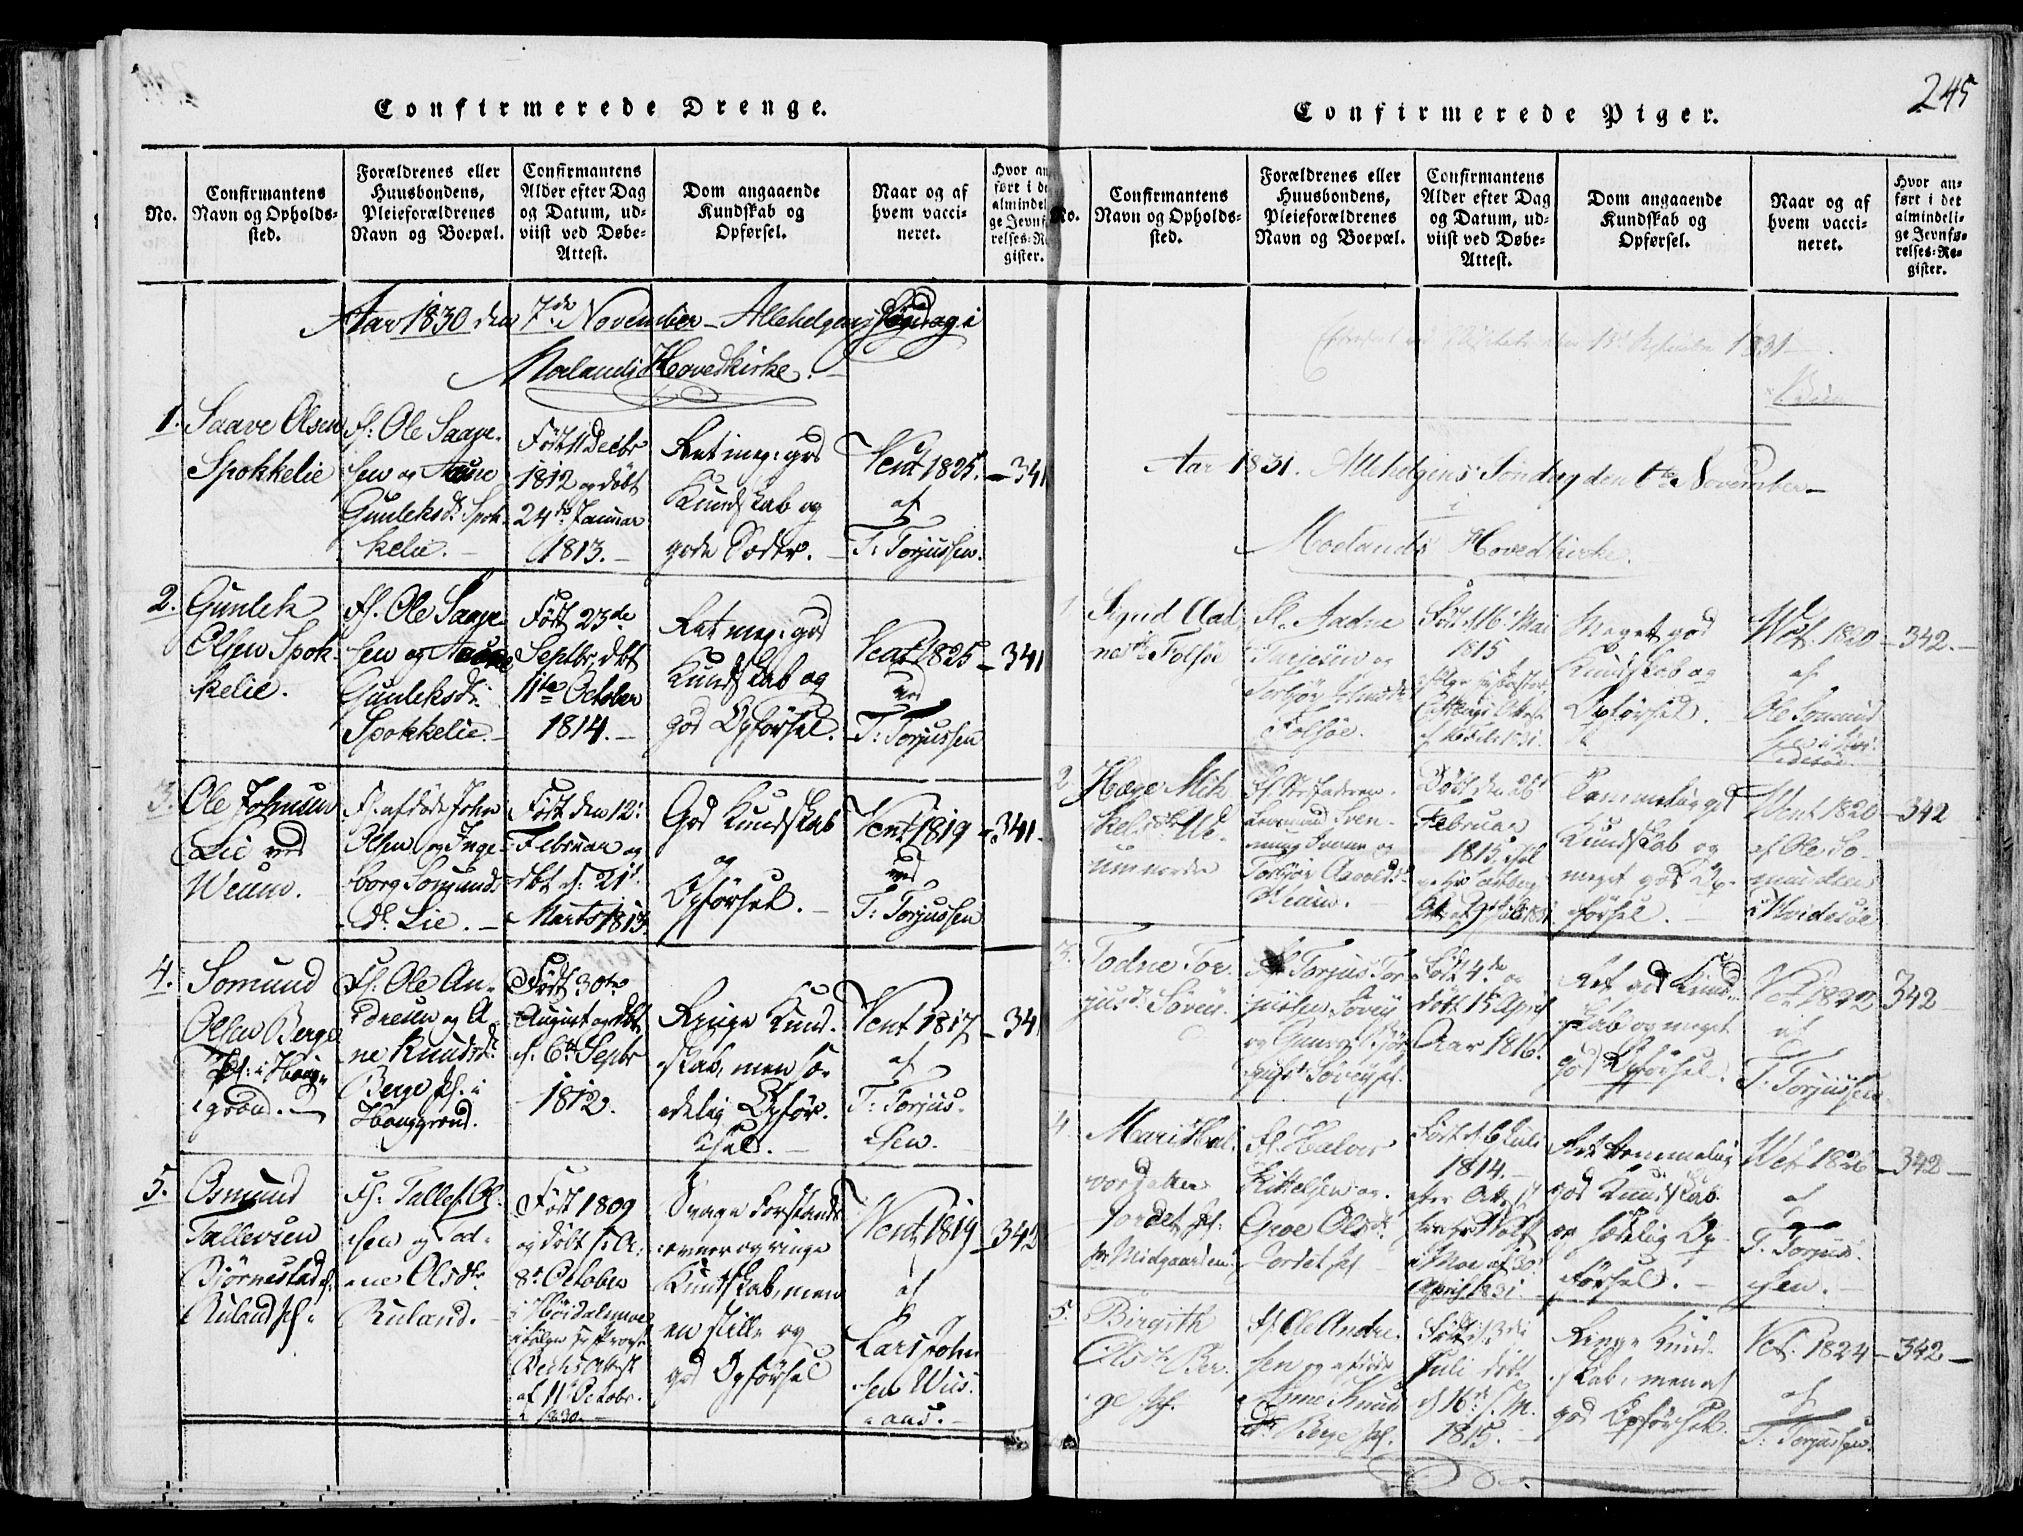 SAKO, Fyresdal kirkebøker, F/Fb/L0001: Ministerialbok nr. II 1, 1815-1854, s. 245